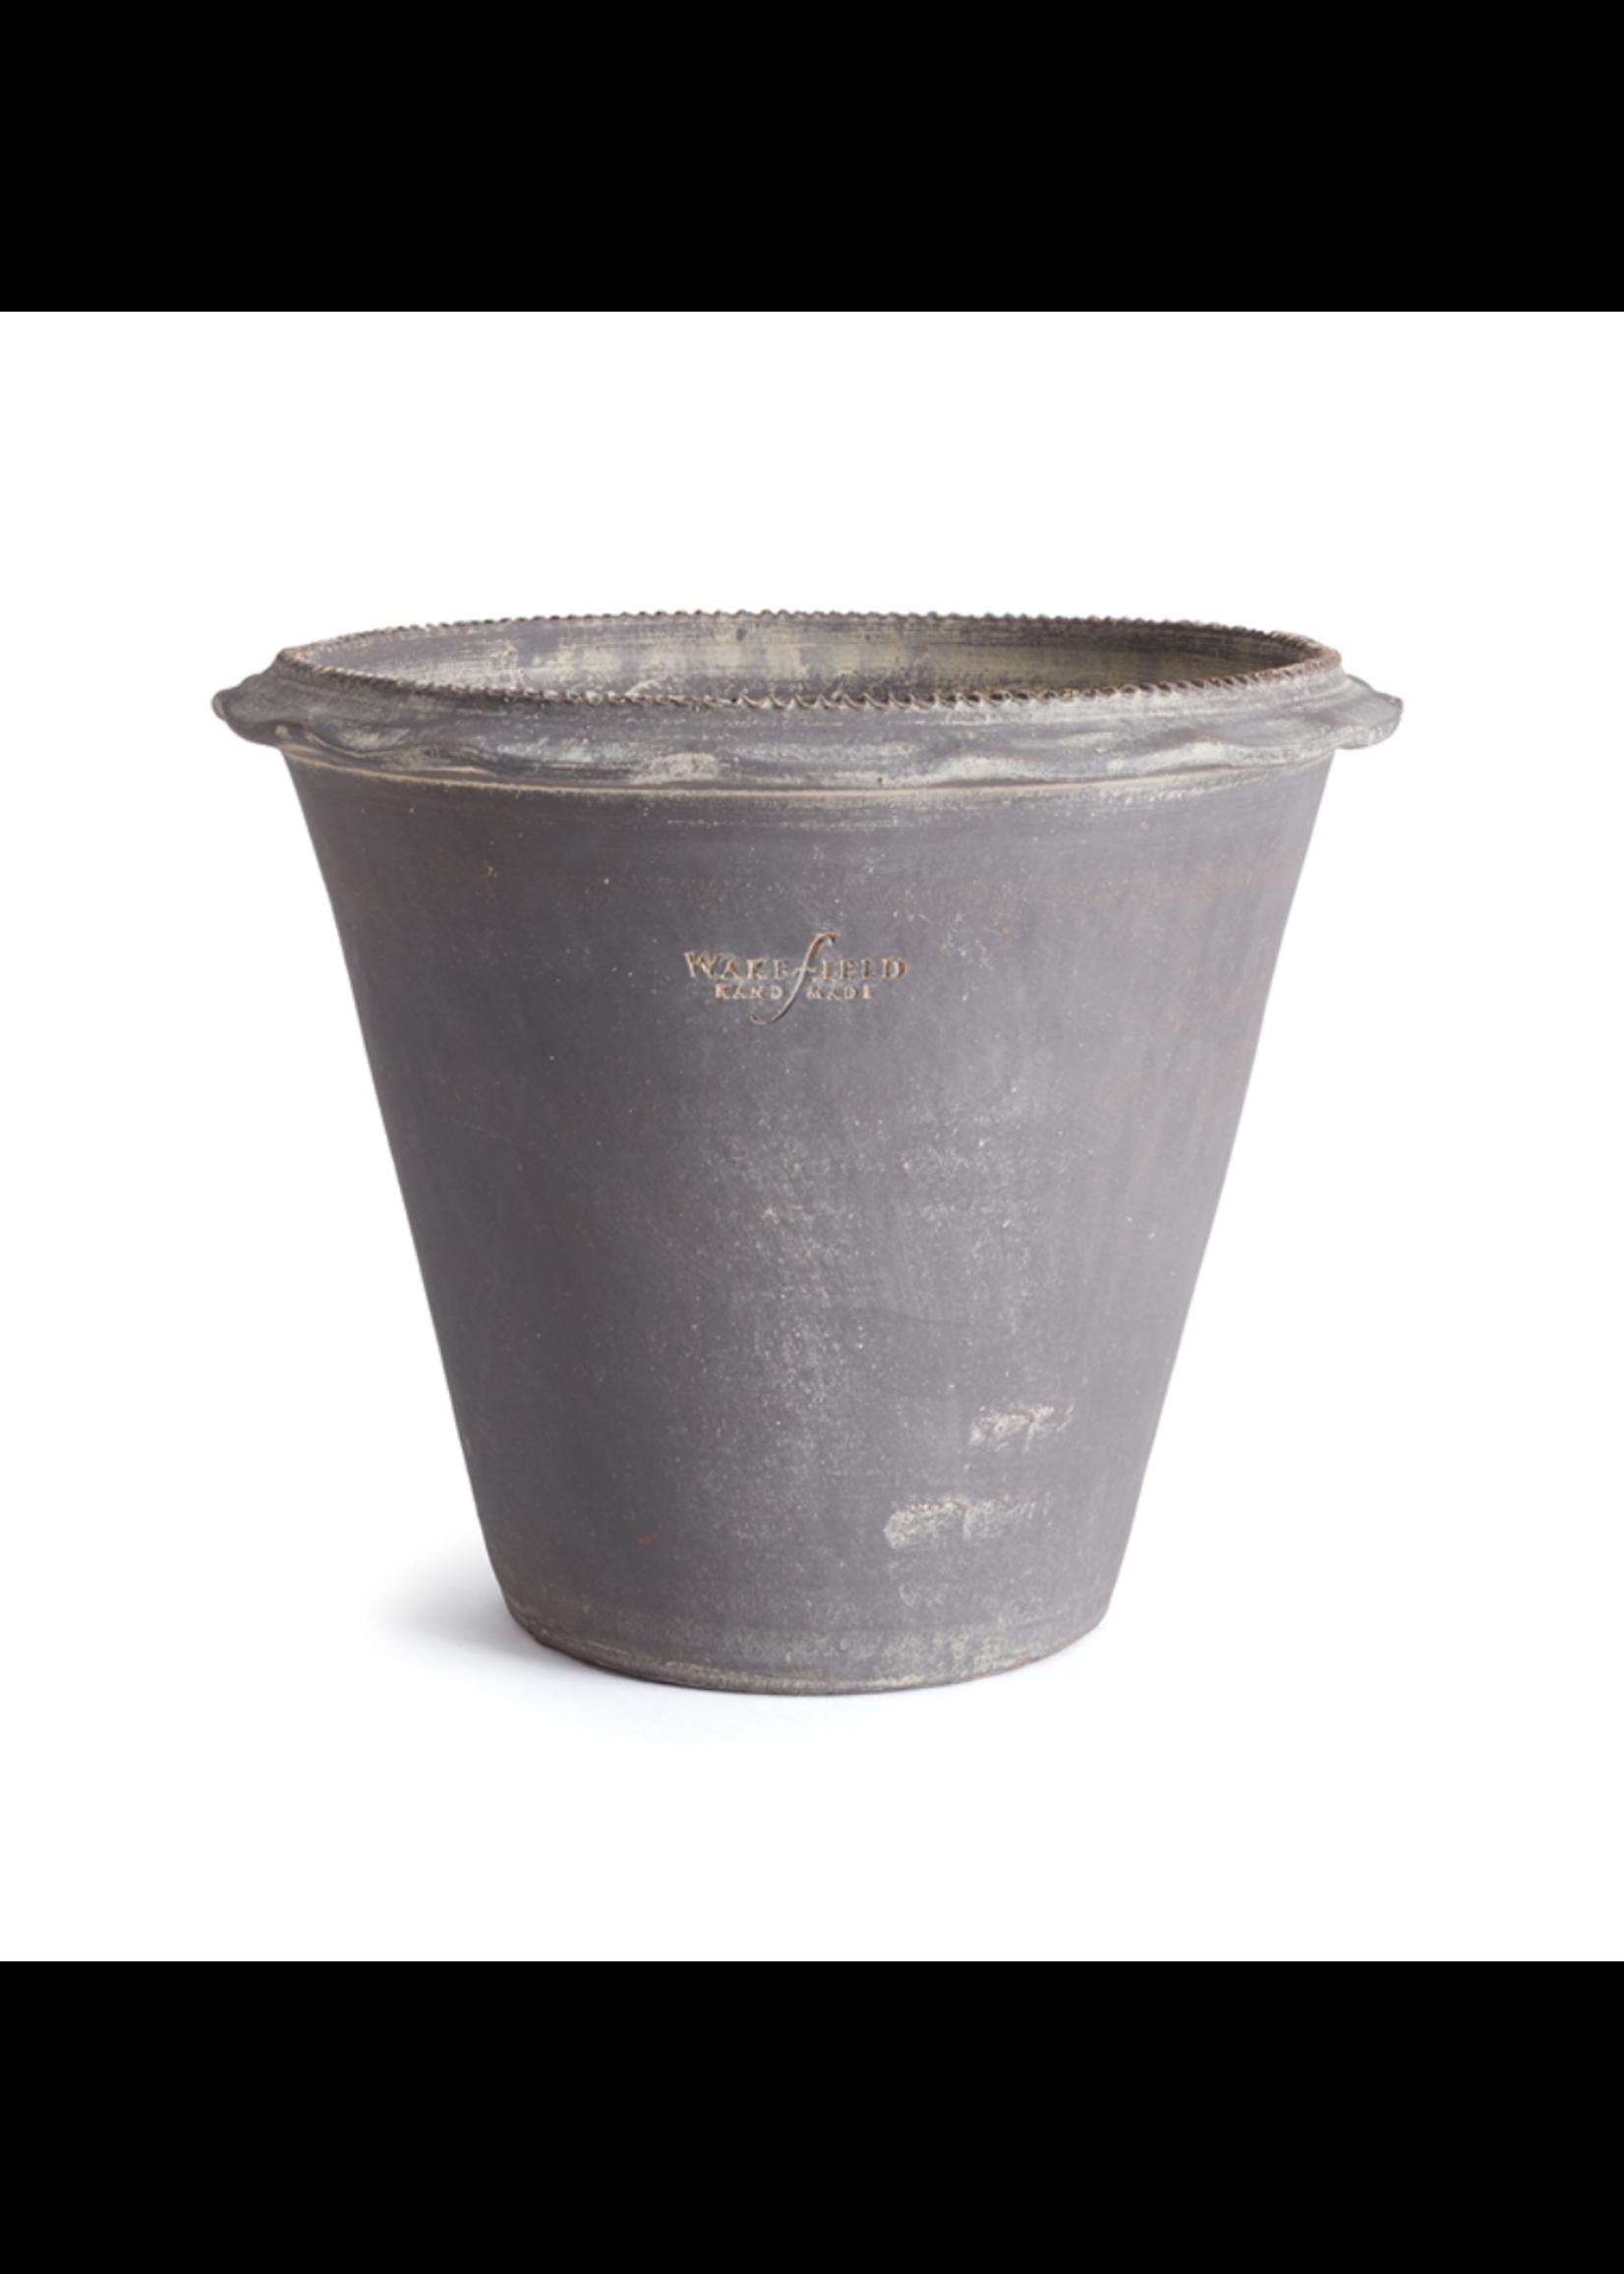 Wakefield Pottery - Norwood Pot - Grey #10